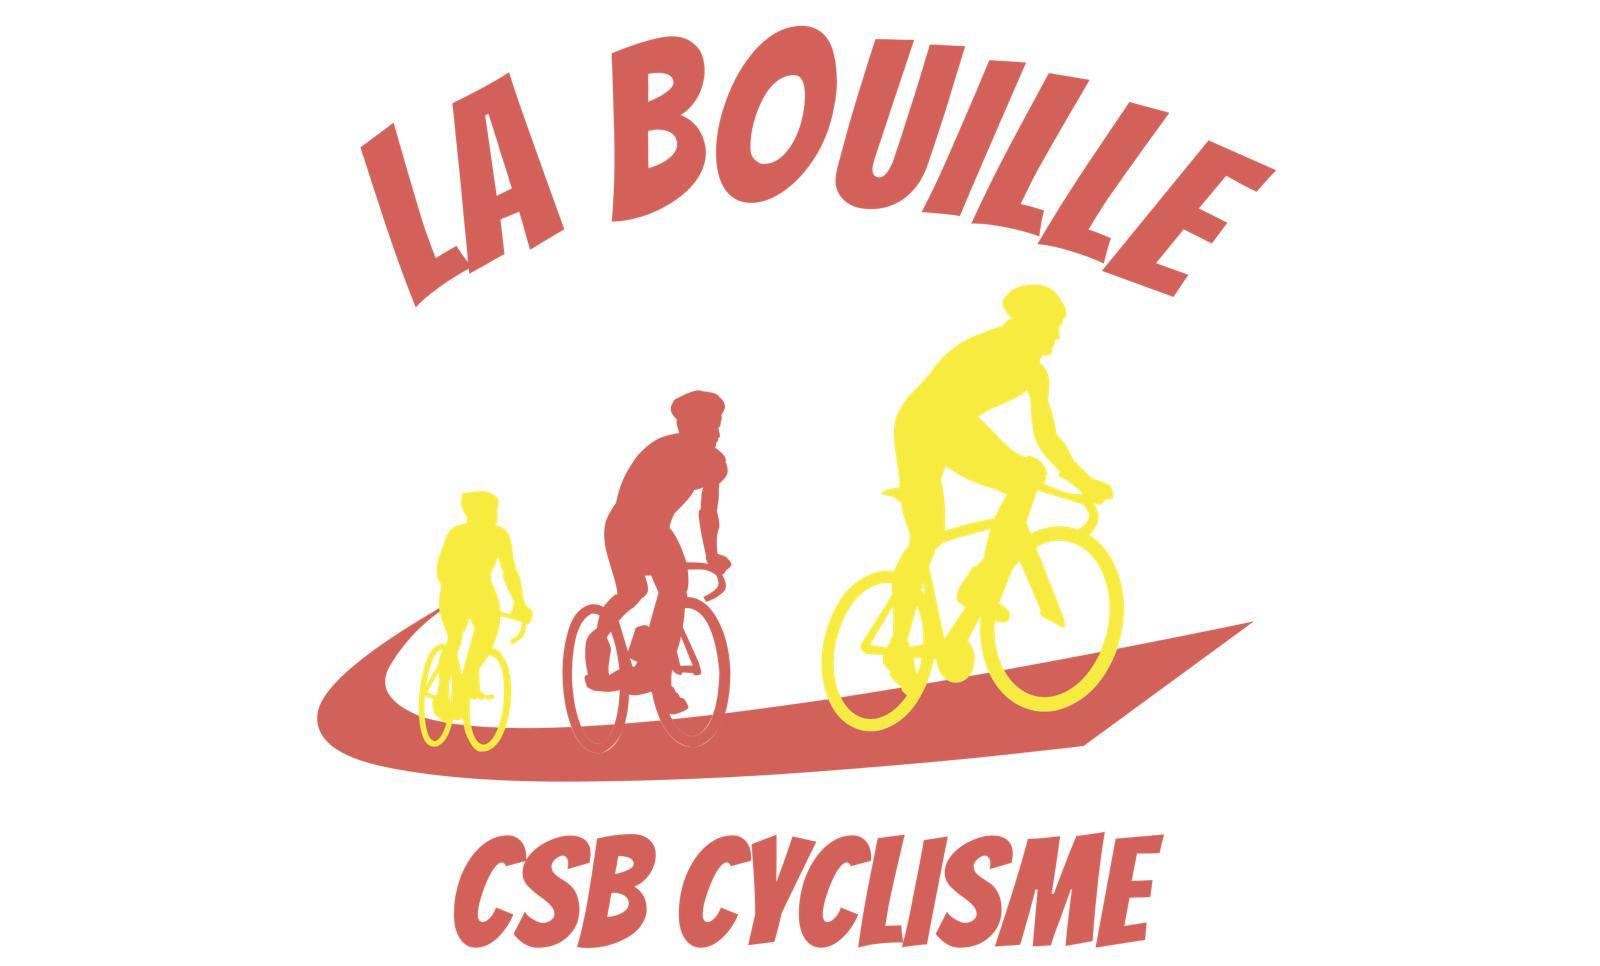 Cyclisme CSB